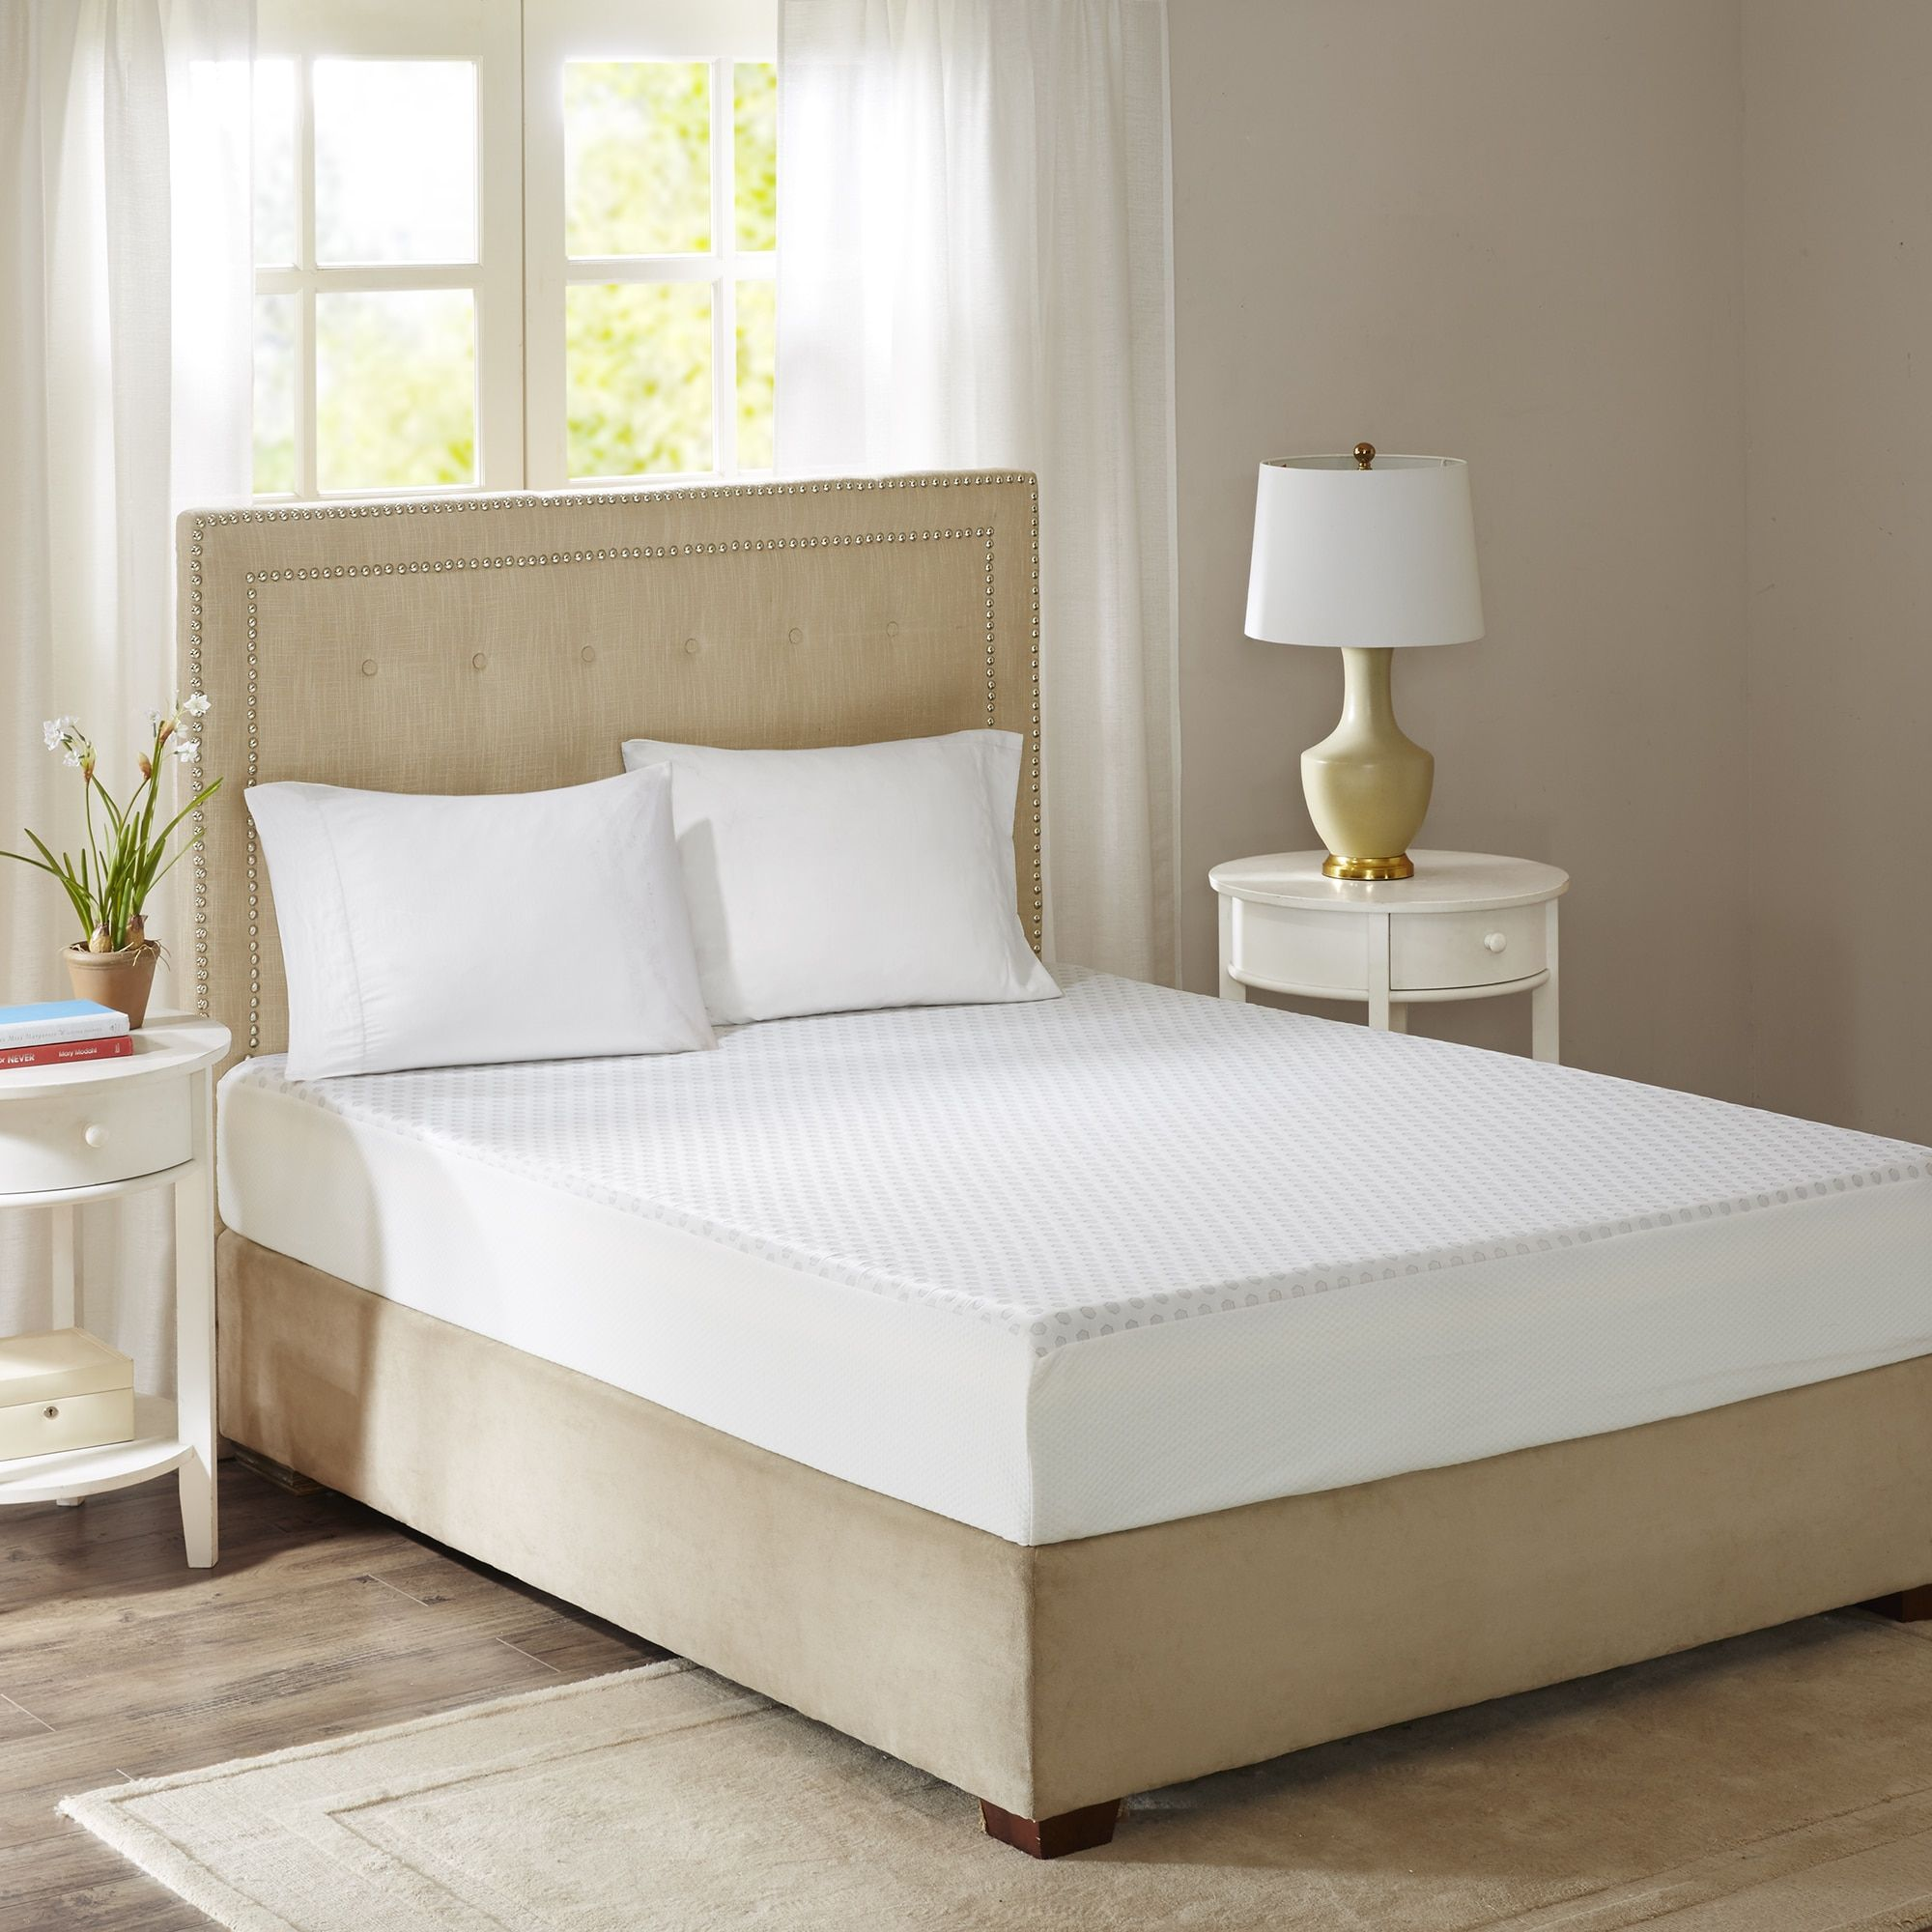 store retailer mattresses ga savannah mattress comfortcare sleep restonic picture frog select green reviews in king center